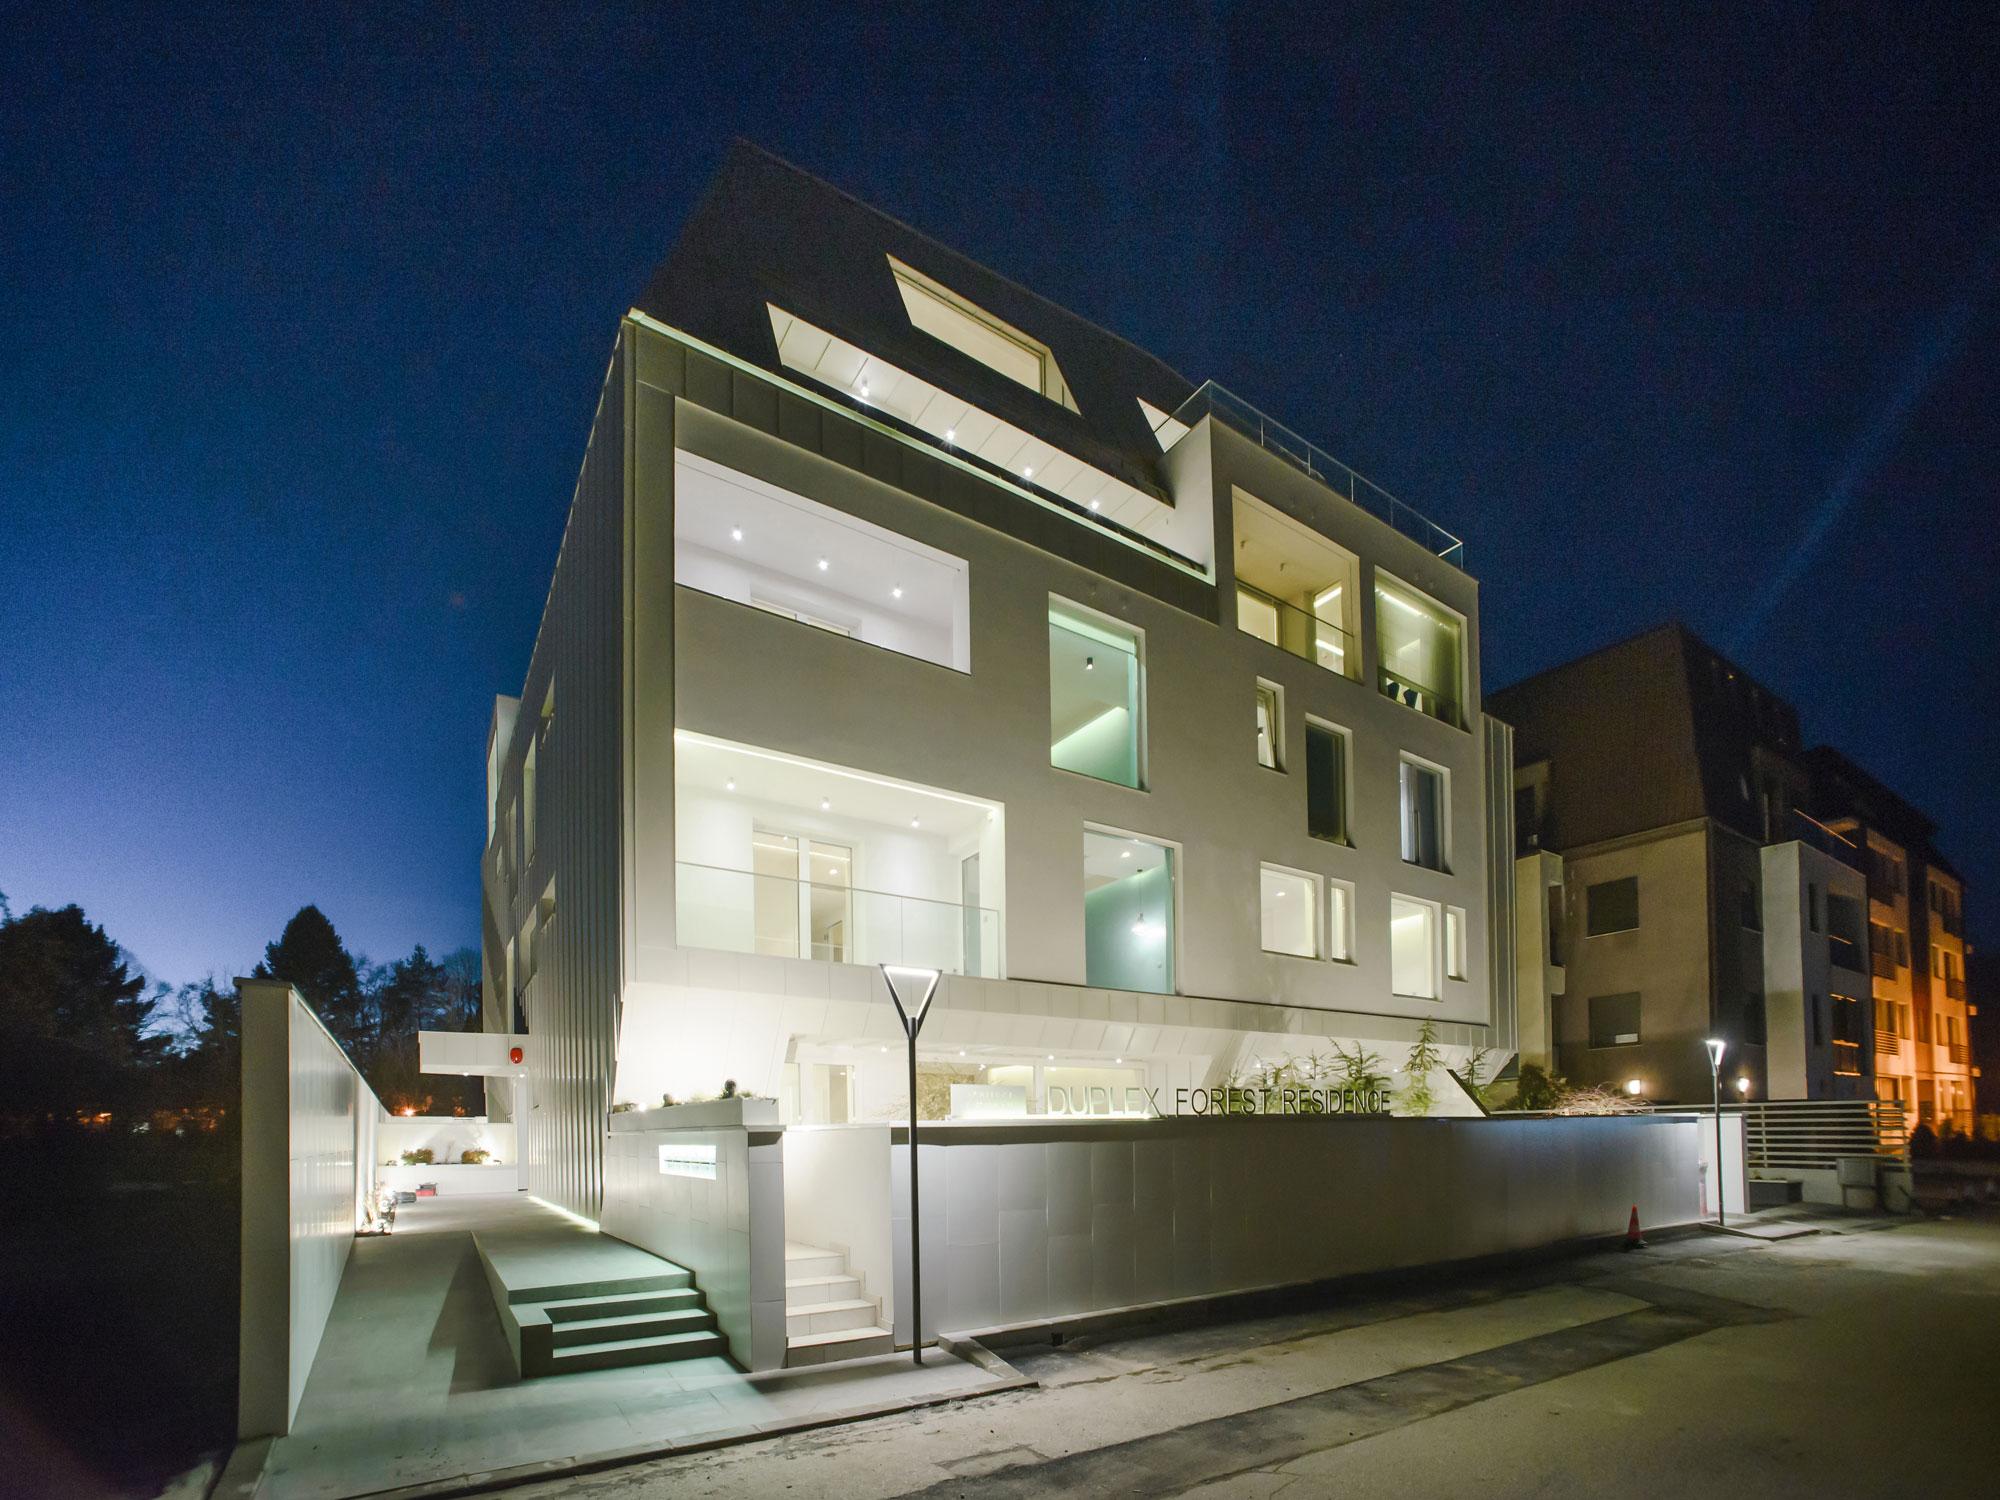 https://nbc-arhitect.ro/wp-content/uploads/2020/10/NBC-Arhitect-_-residential-_-Duplex-Forest-Residence-_-Romania_46.jpg